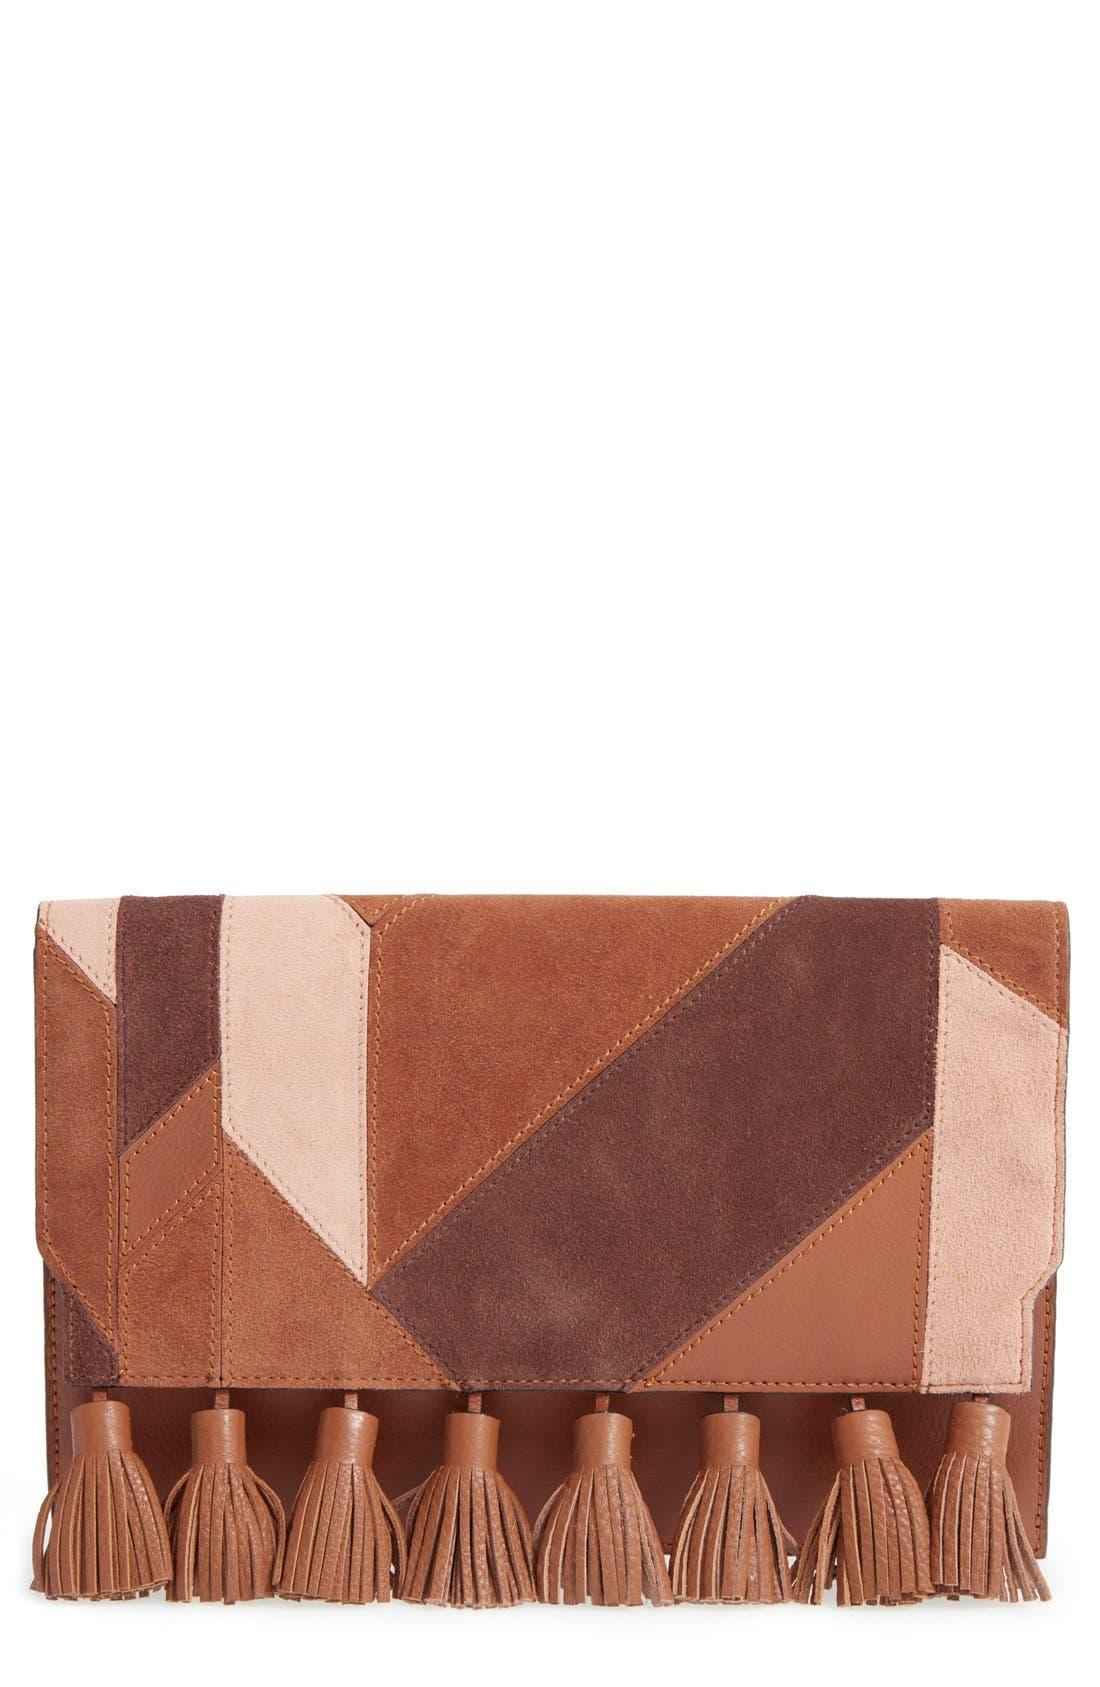 Alternate Image 1 Selected - Rebecca Minkoff 'Sofia' Tassel Patchwork Leather Clutch